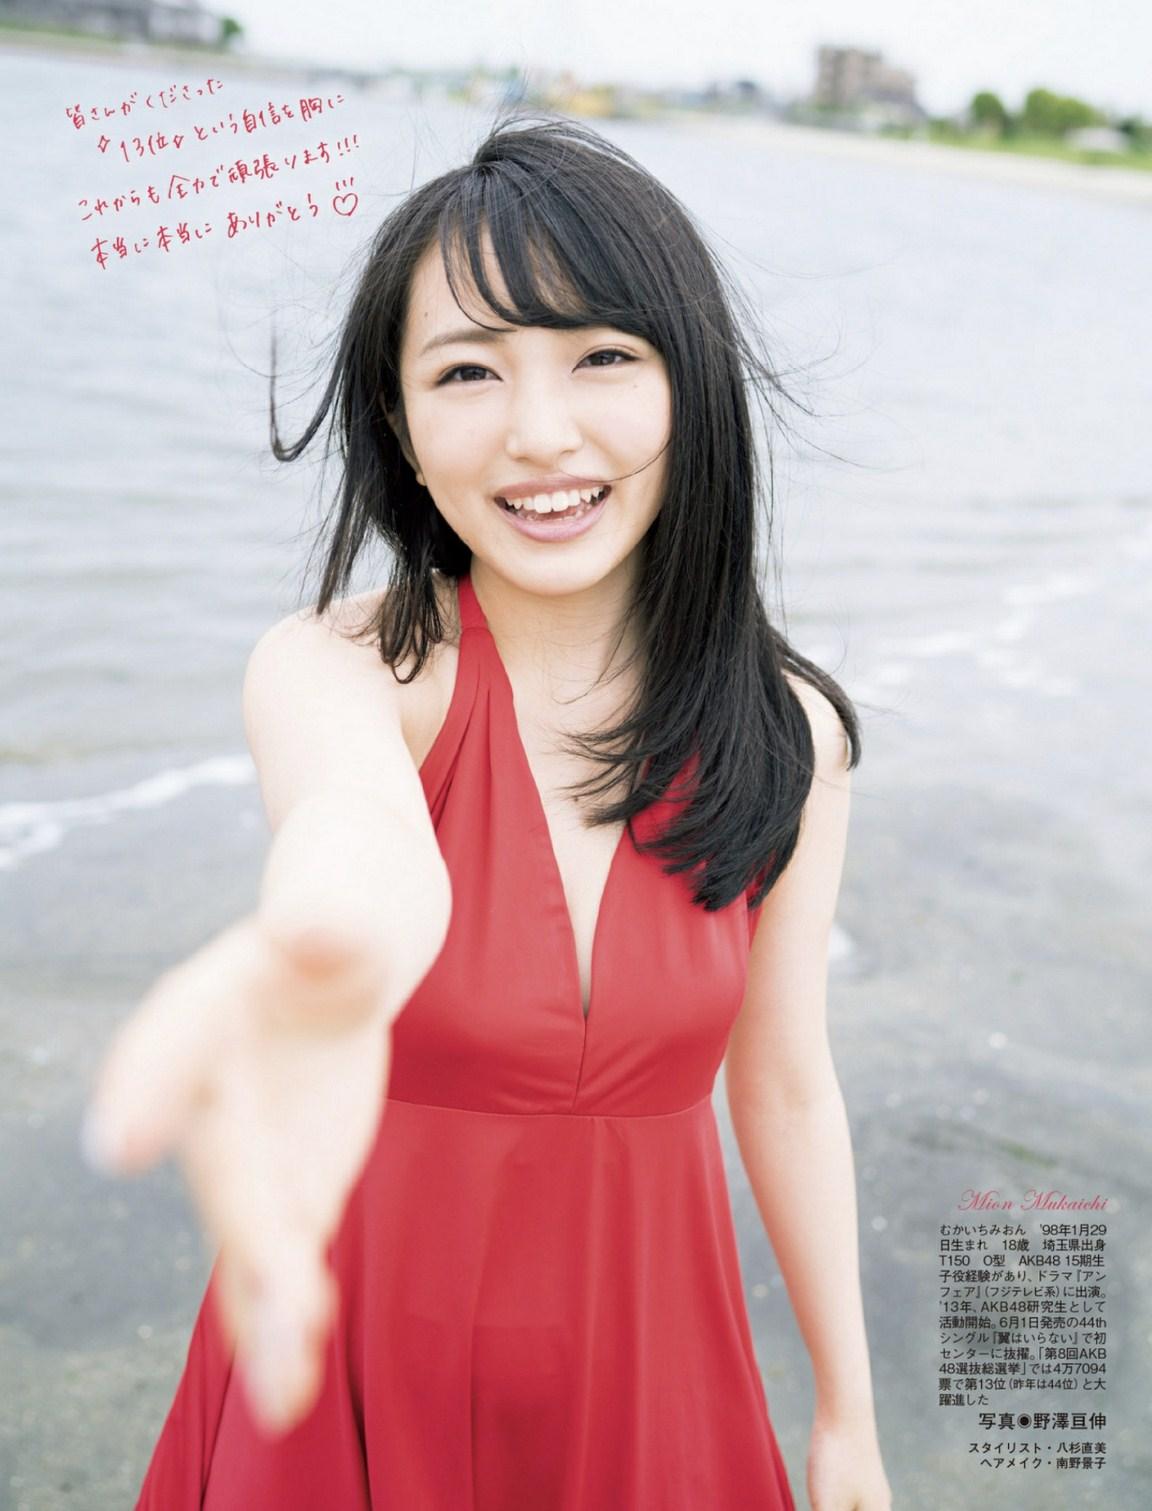 Mukaichi Mion 向井地美音 AKB48, FLASH 2016.07.19 2016.06 Gravure